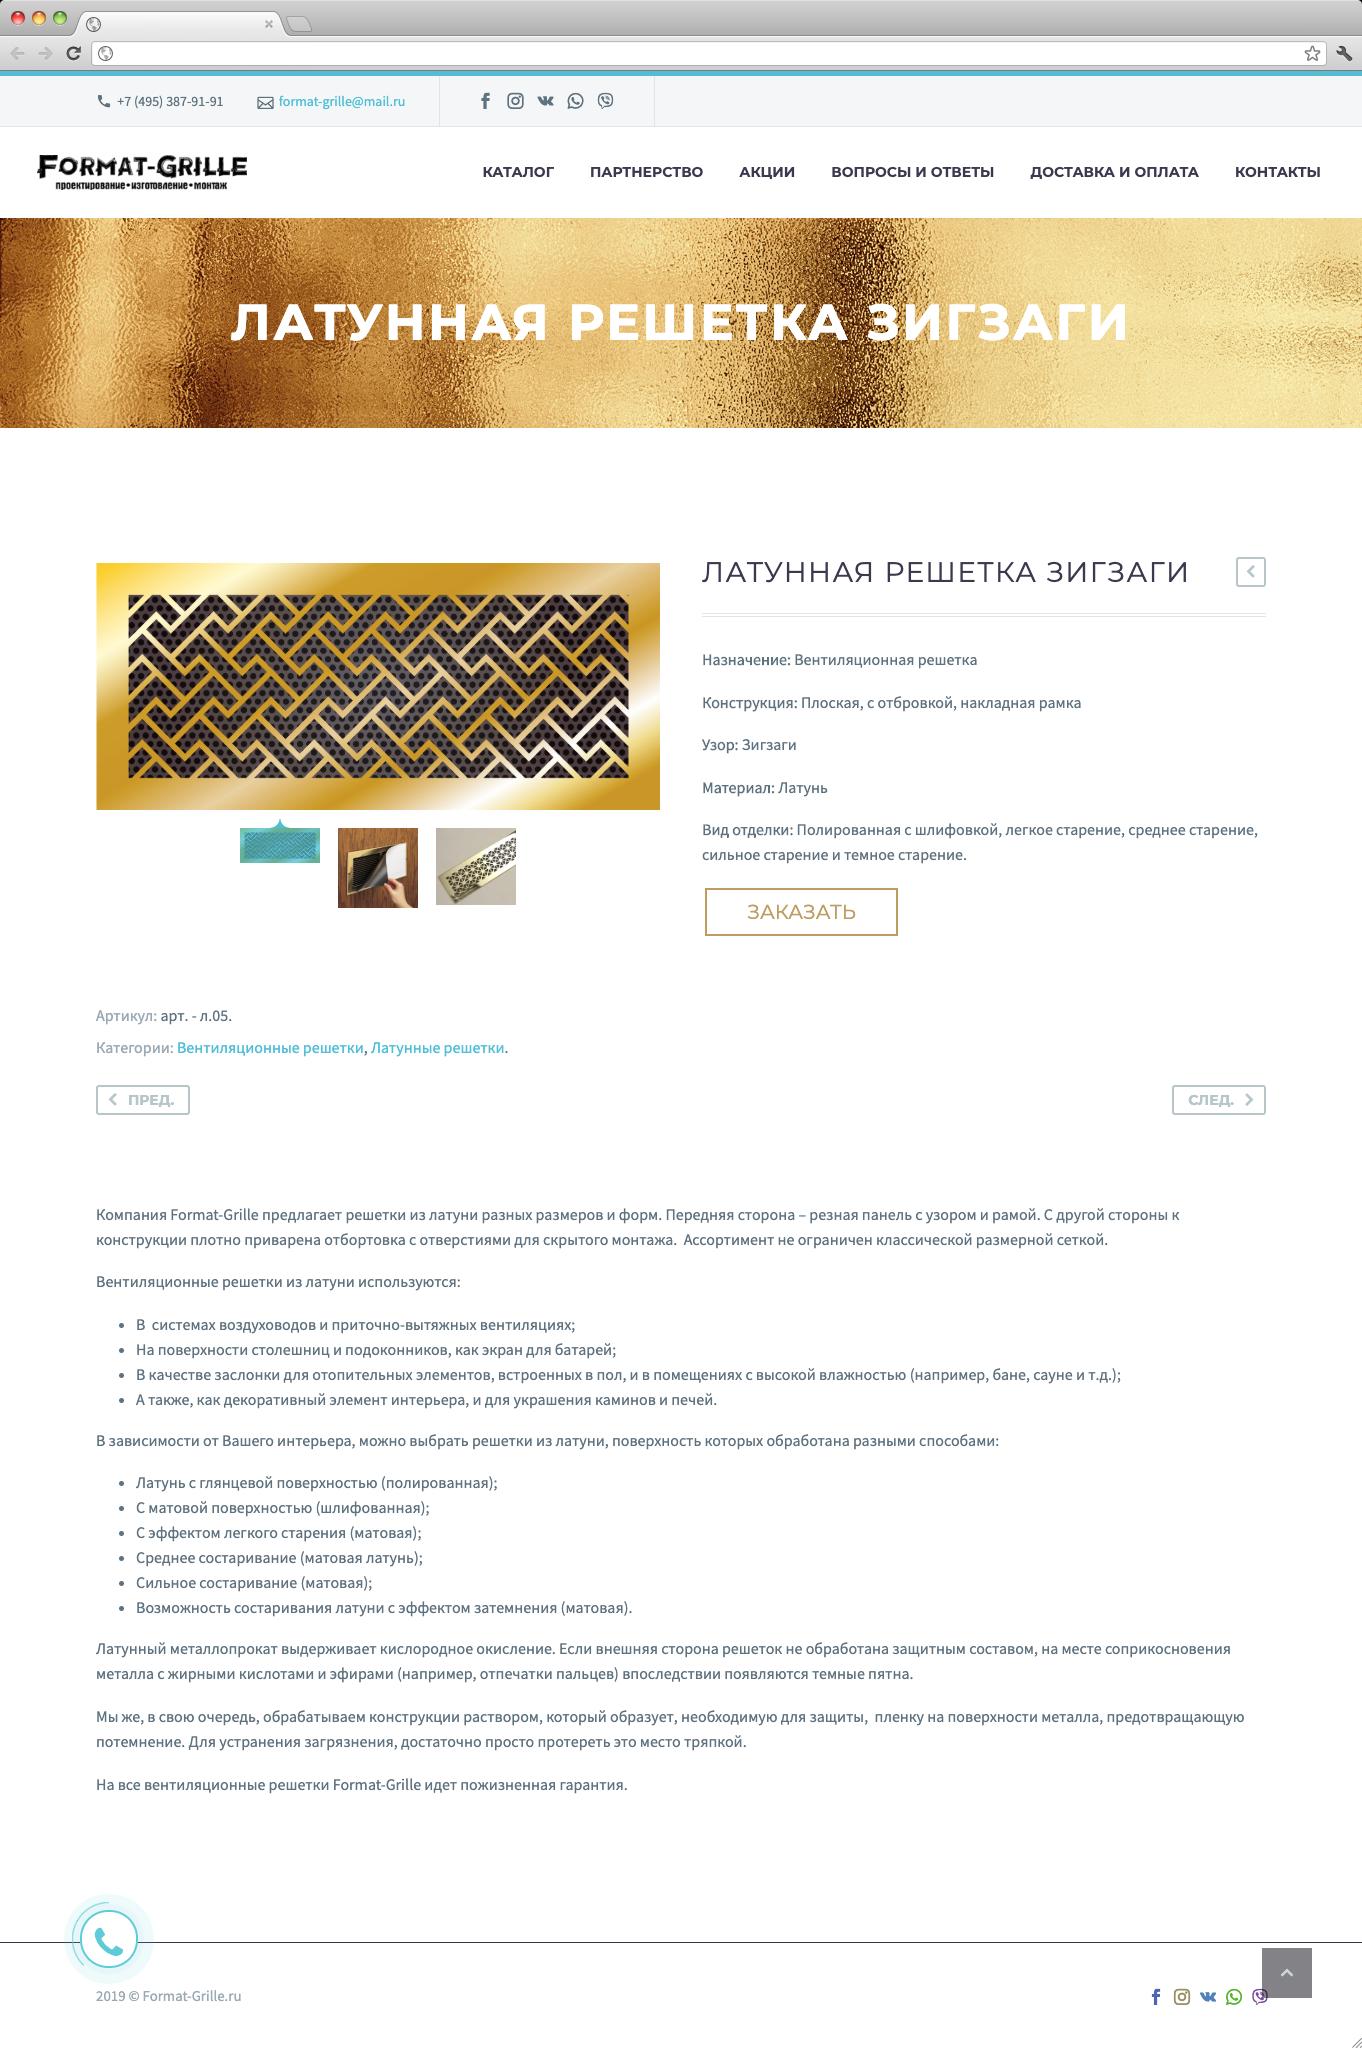 Format-grille (Лендинг/Landing Page + Каталог, Wordpress)